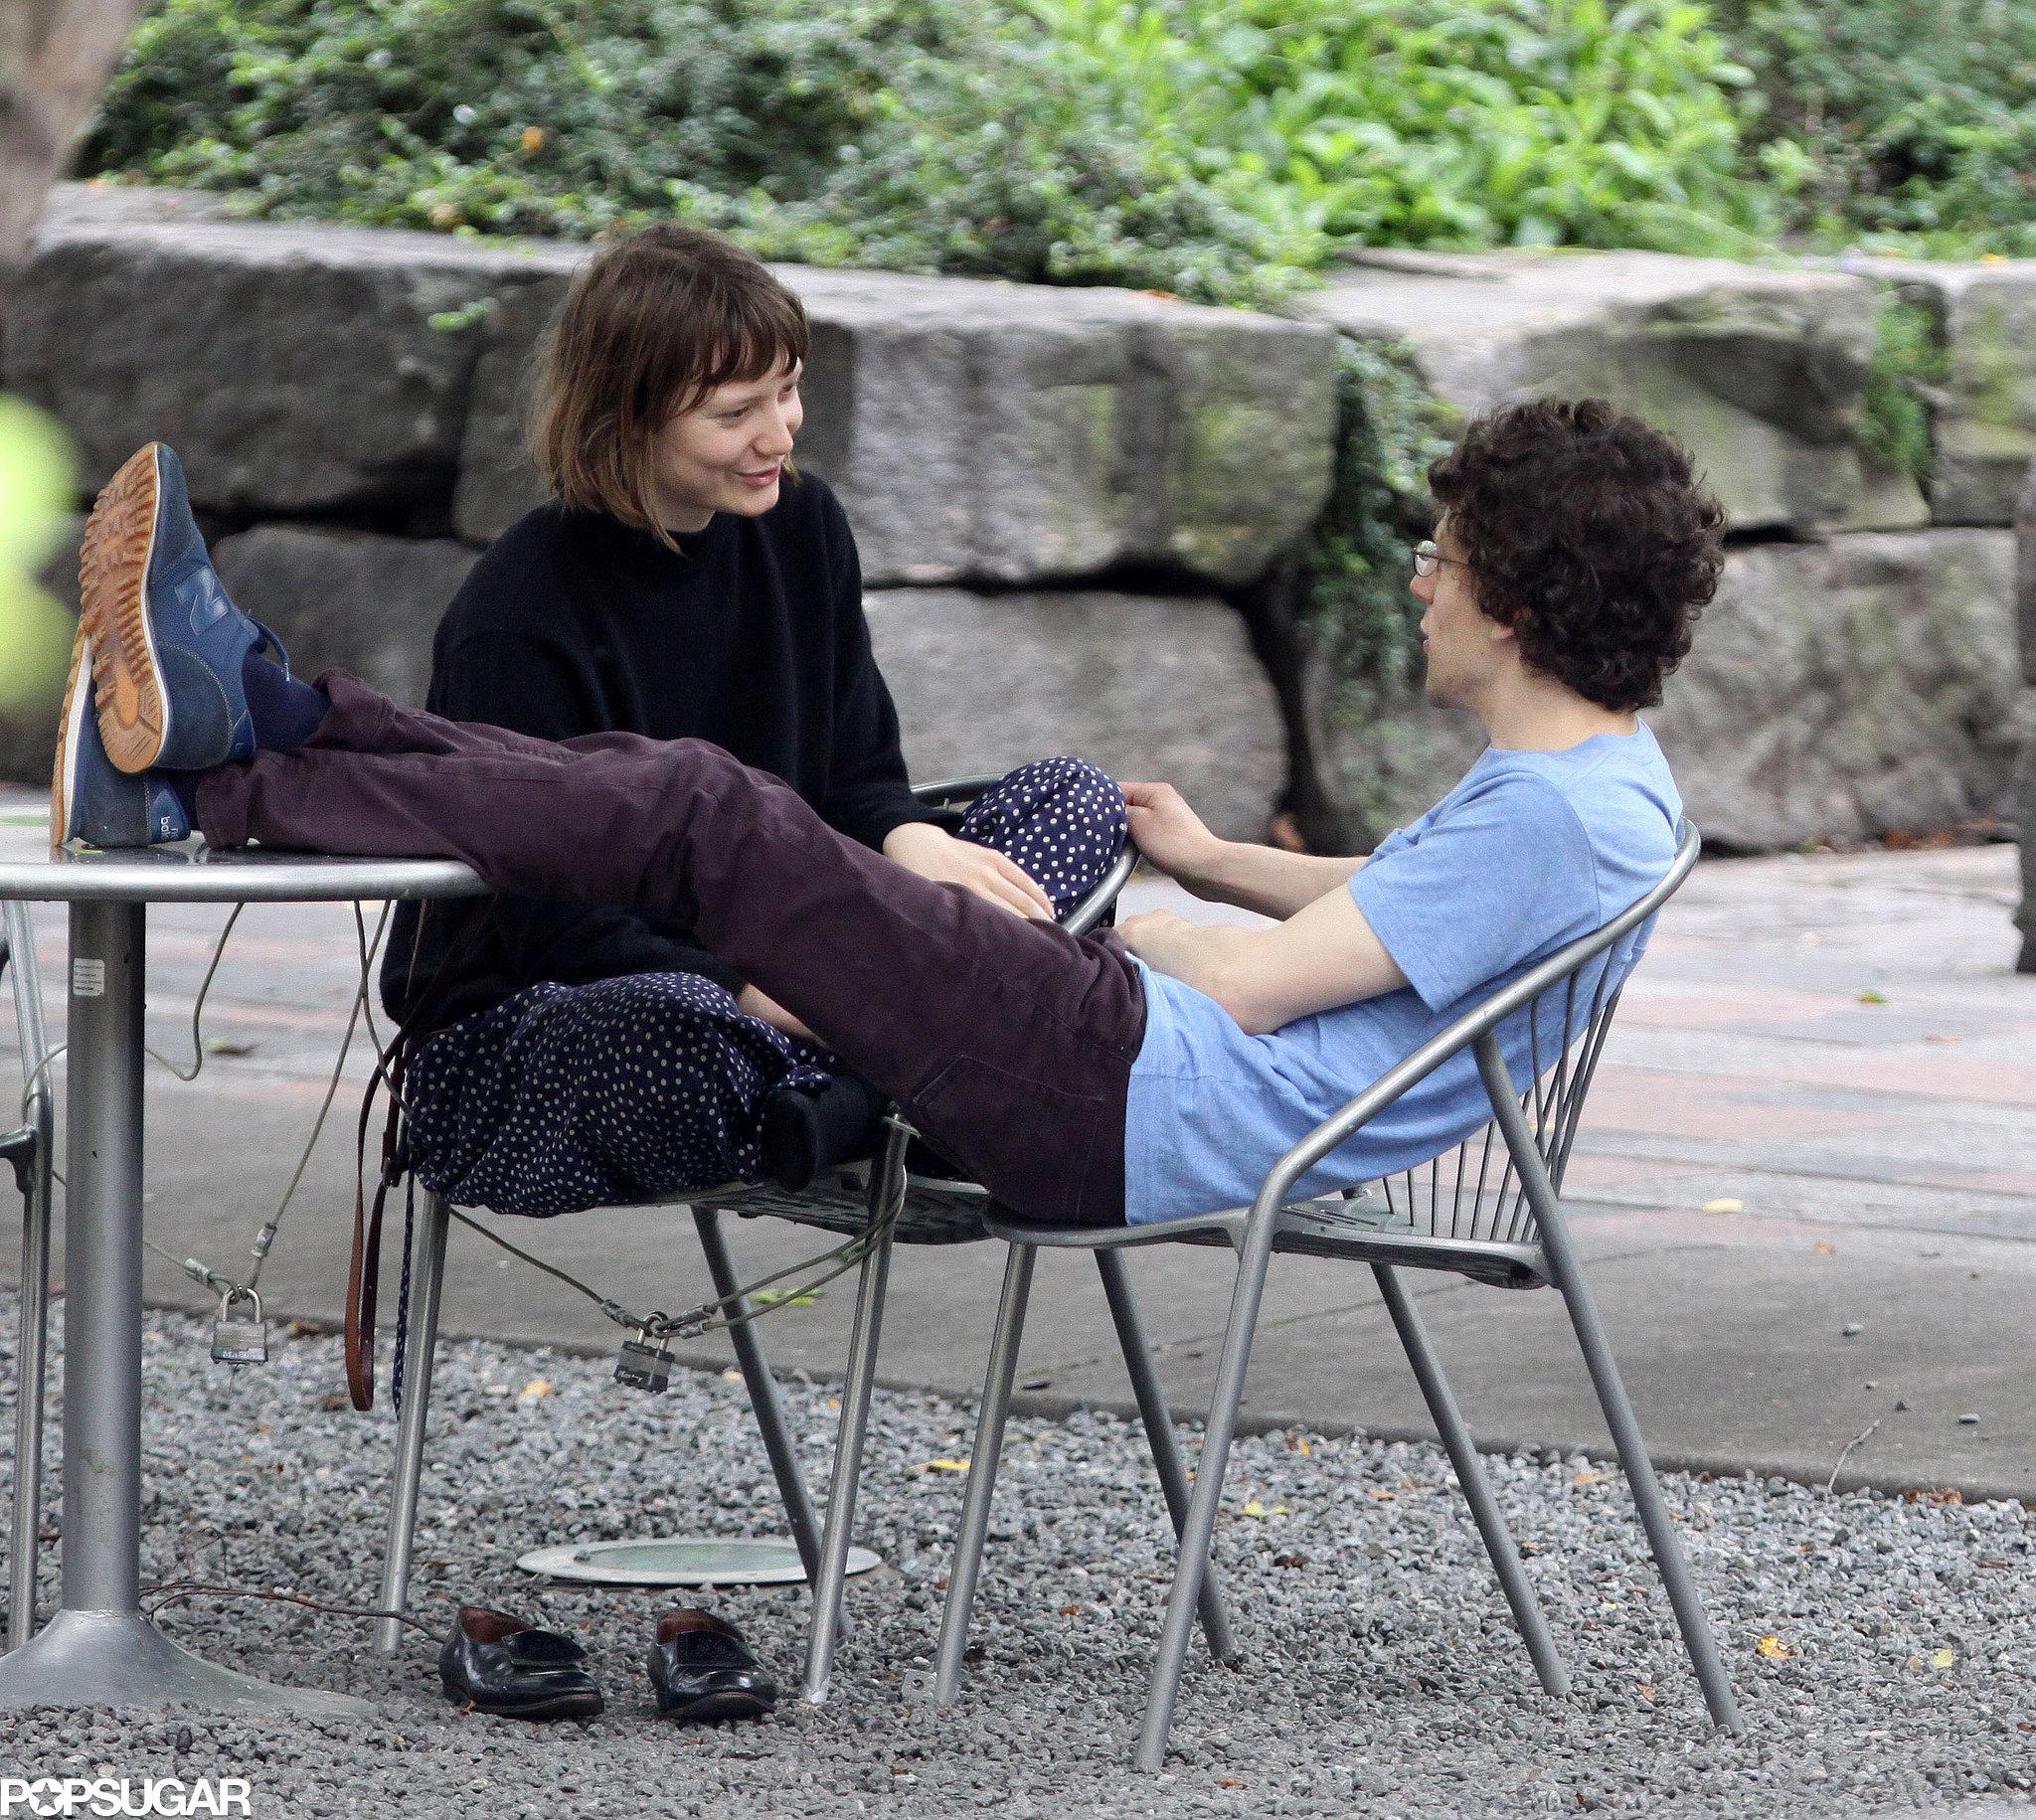 Mia Wasikowska Jesse Eisenberg - Viewing Gallery Michael Fassbender Girlfriend